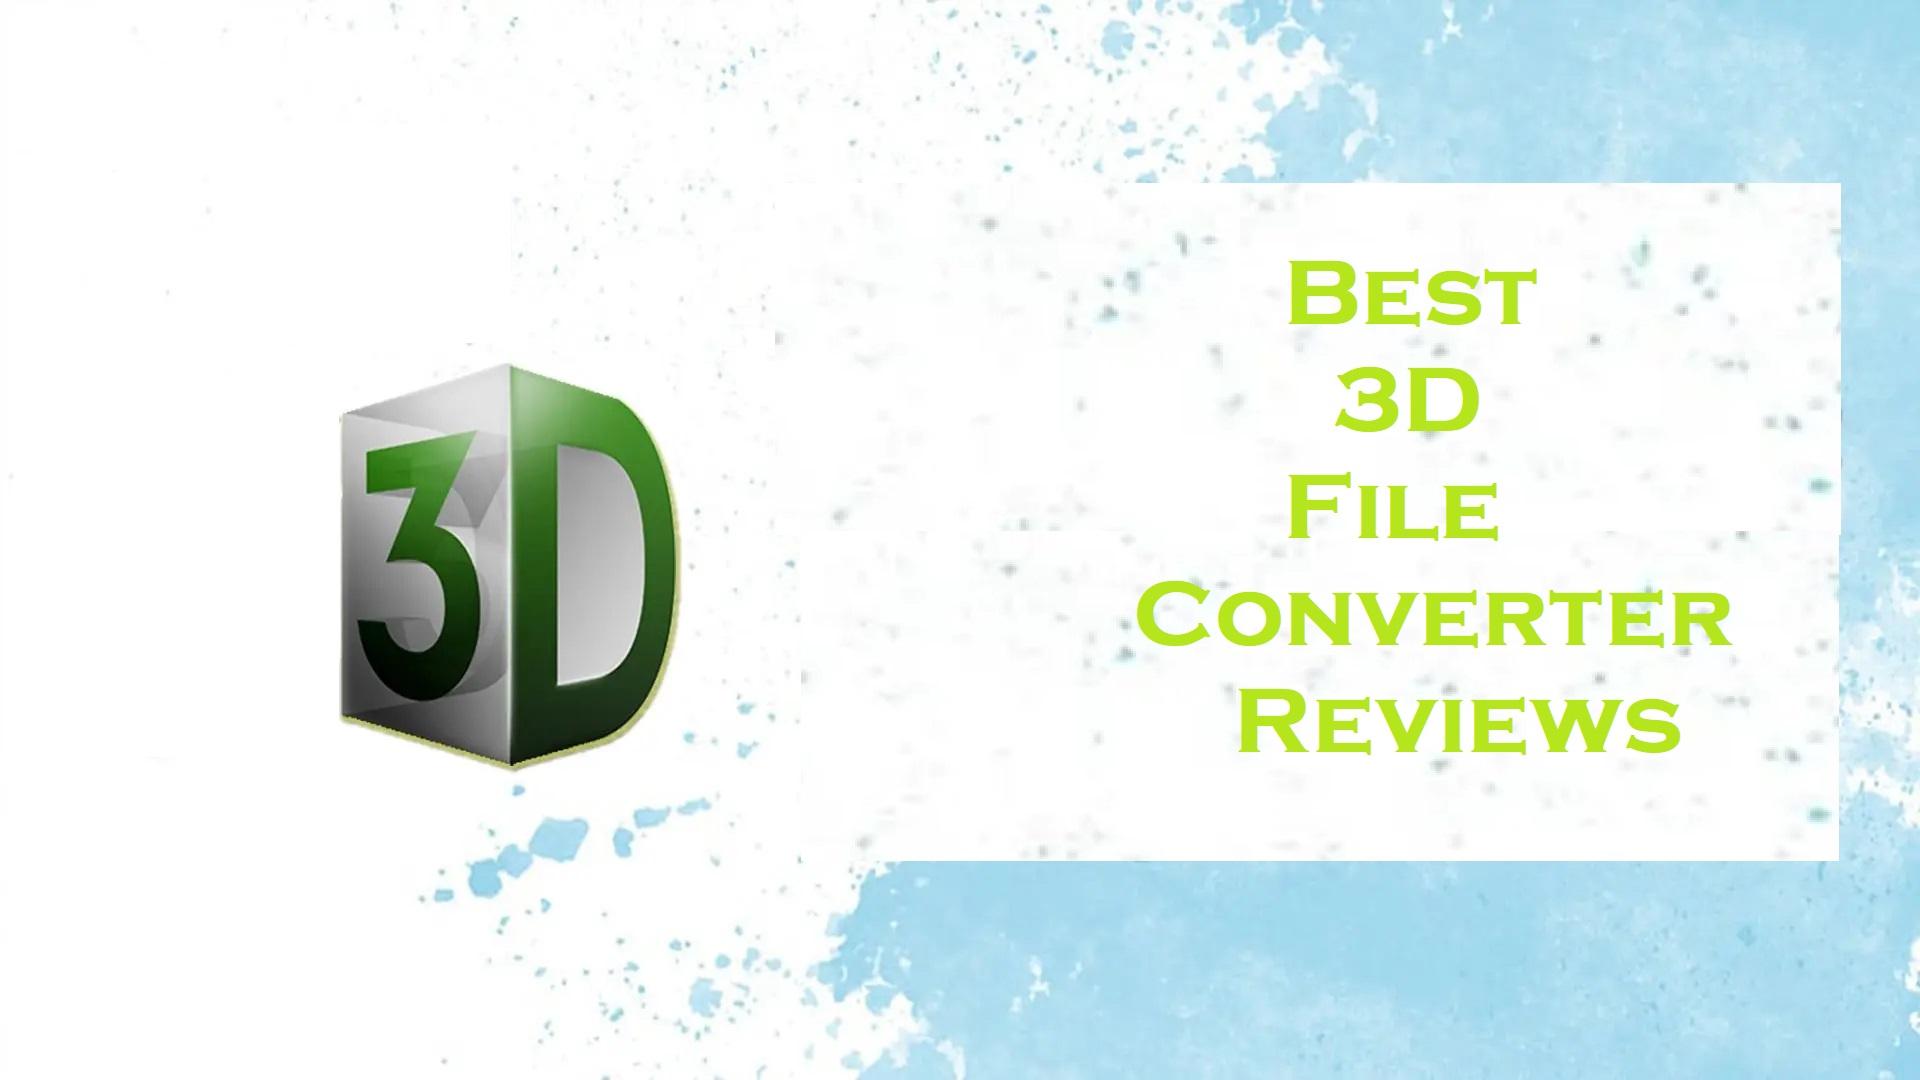 Best 3D File Converter Reviews